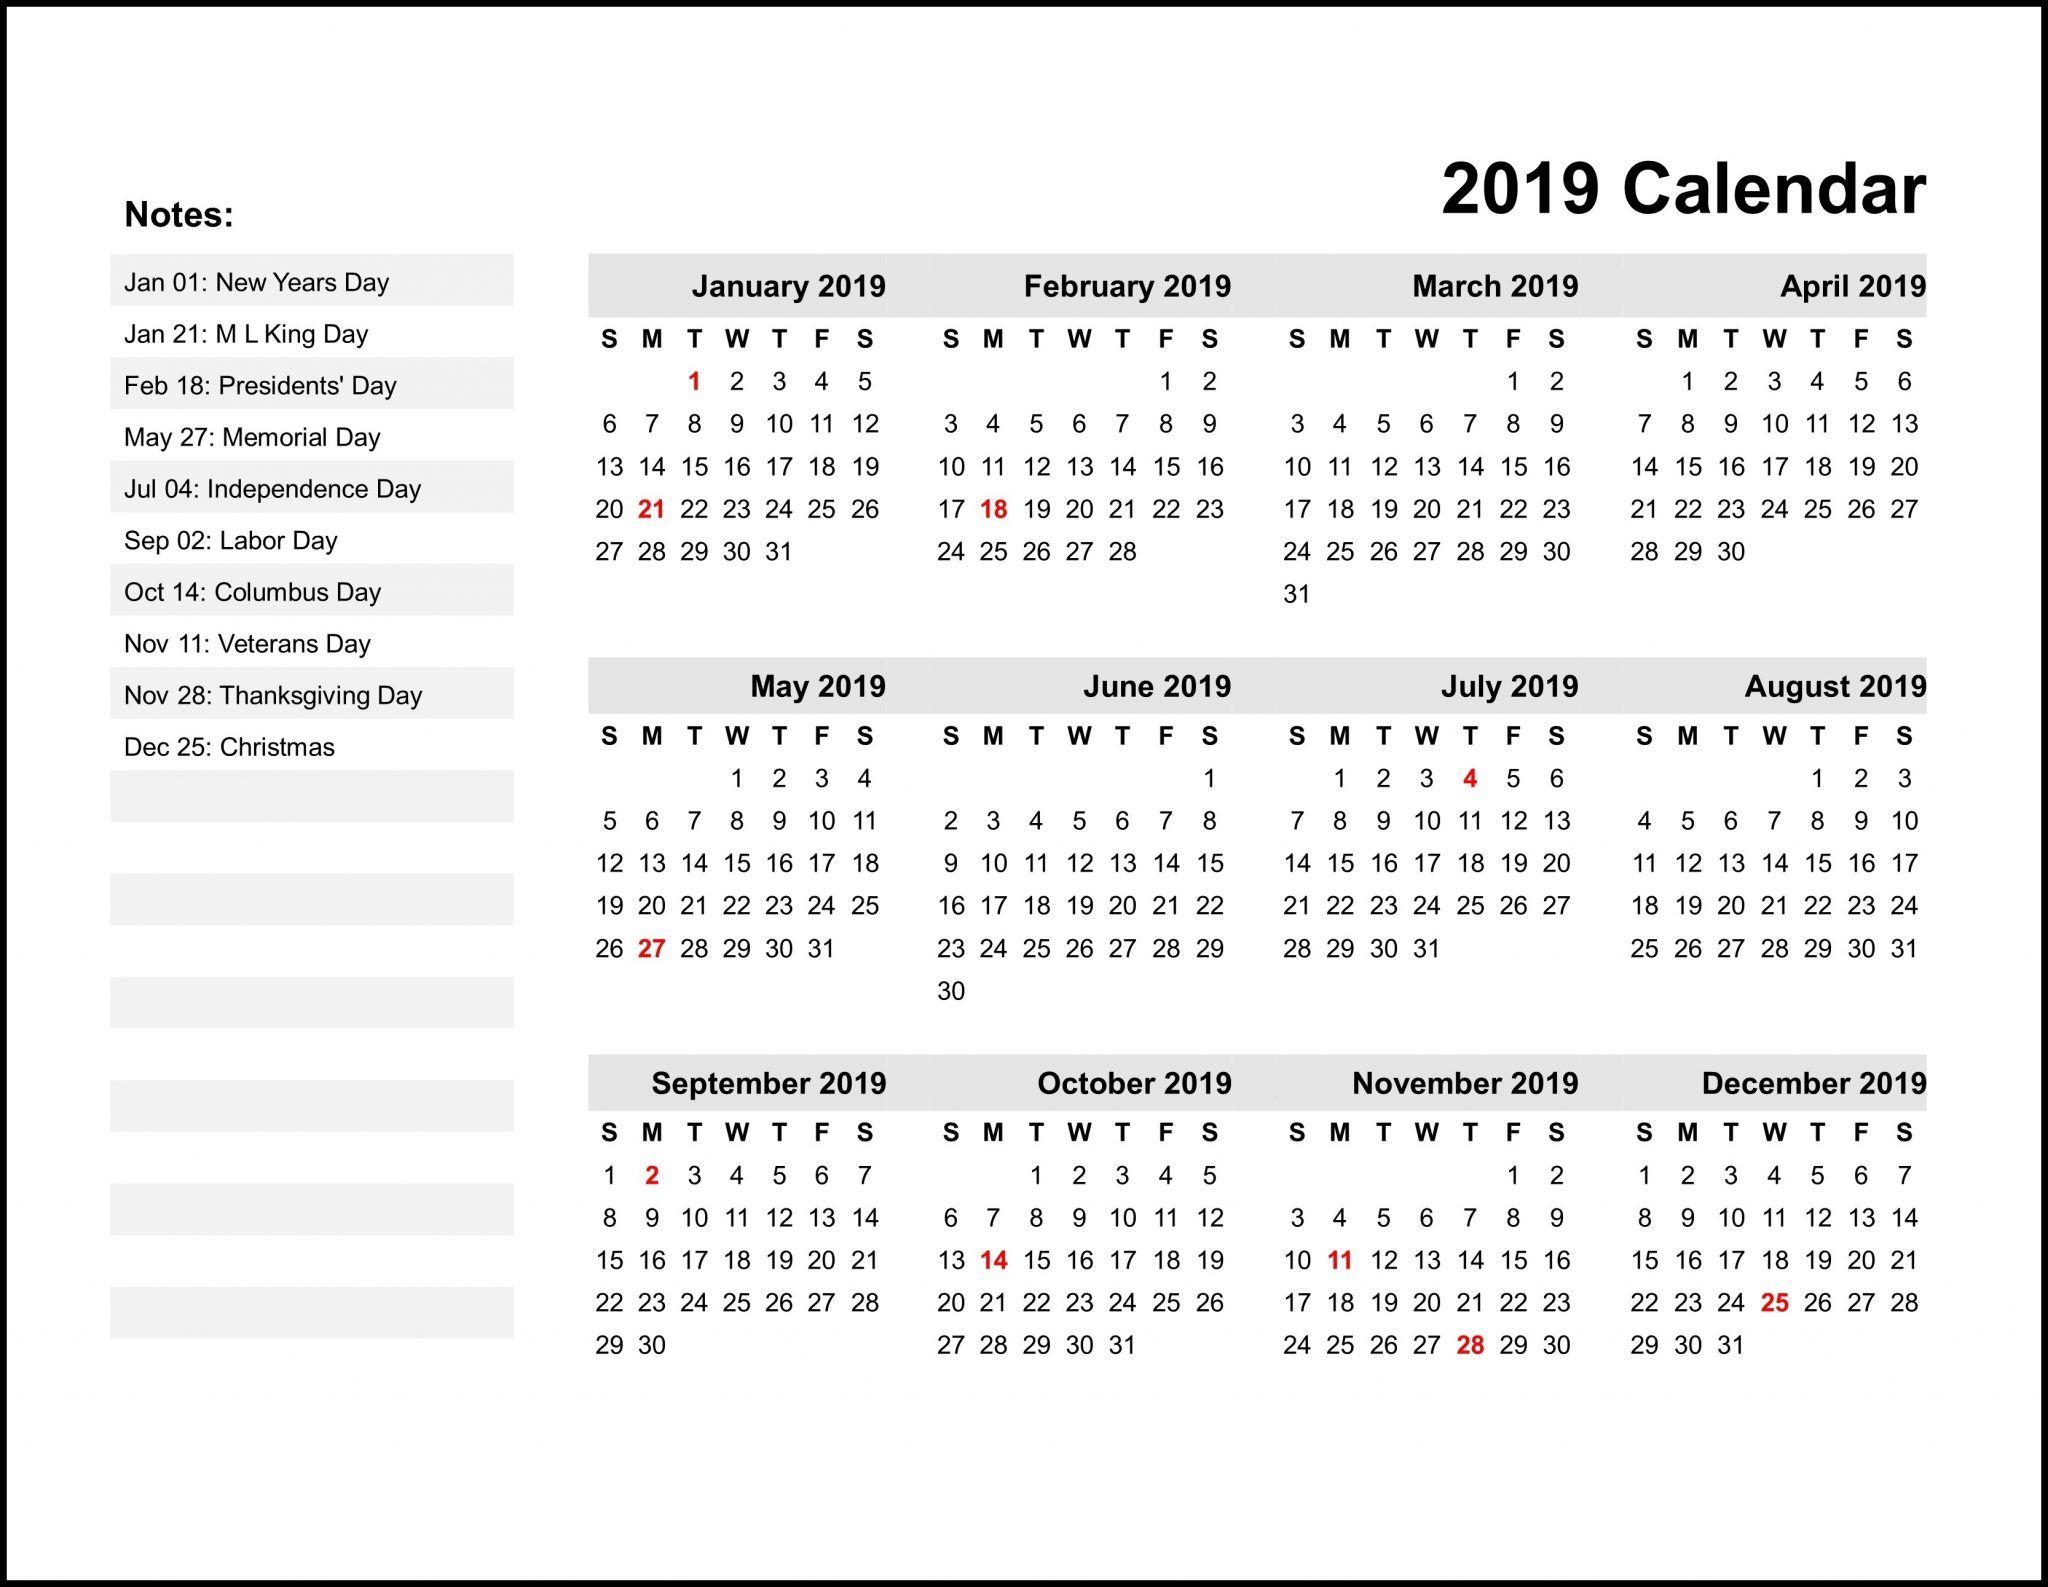 Calendar 2019 India Holidays Printable Yearly Calendar Calendar Printables Monthly Calendar Printable